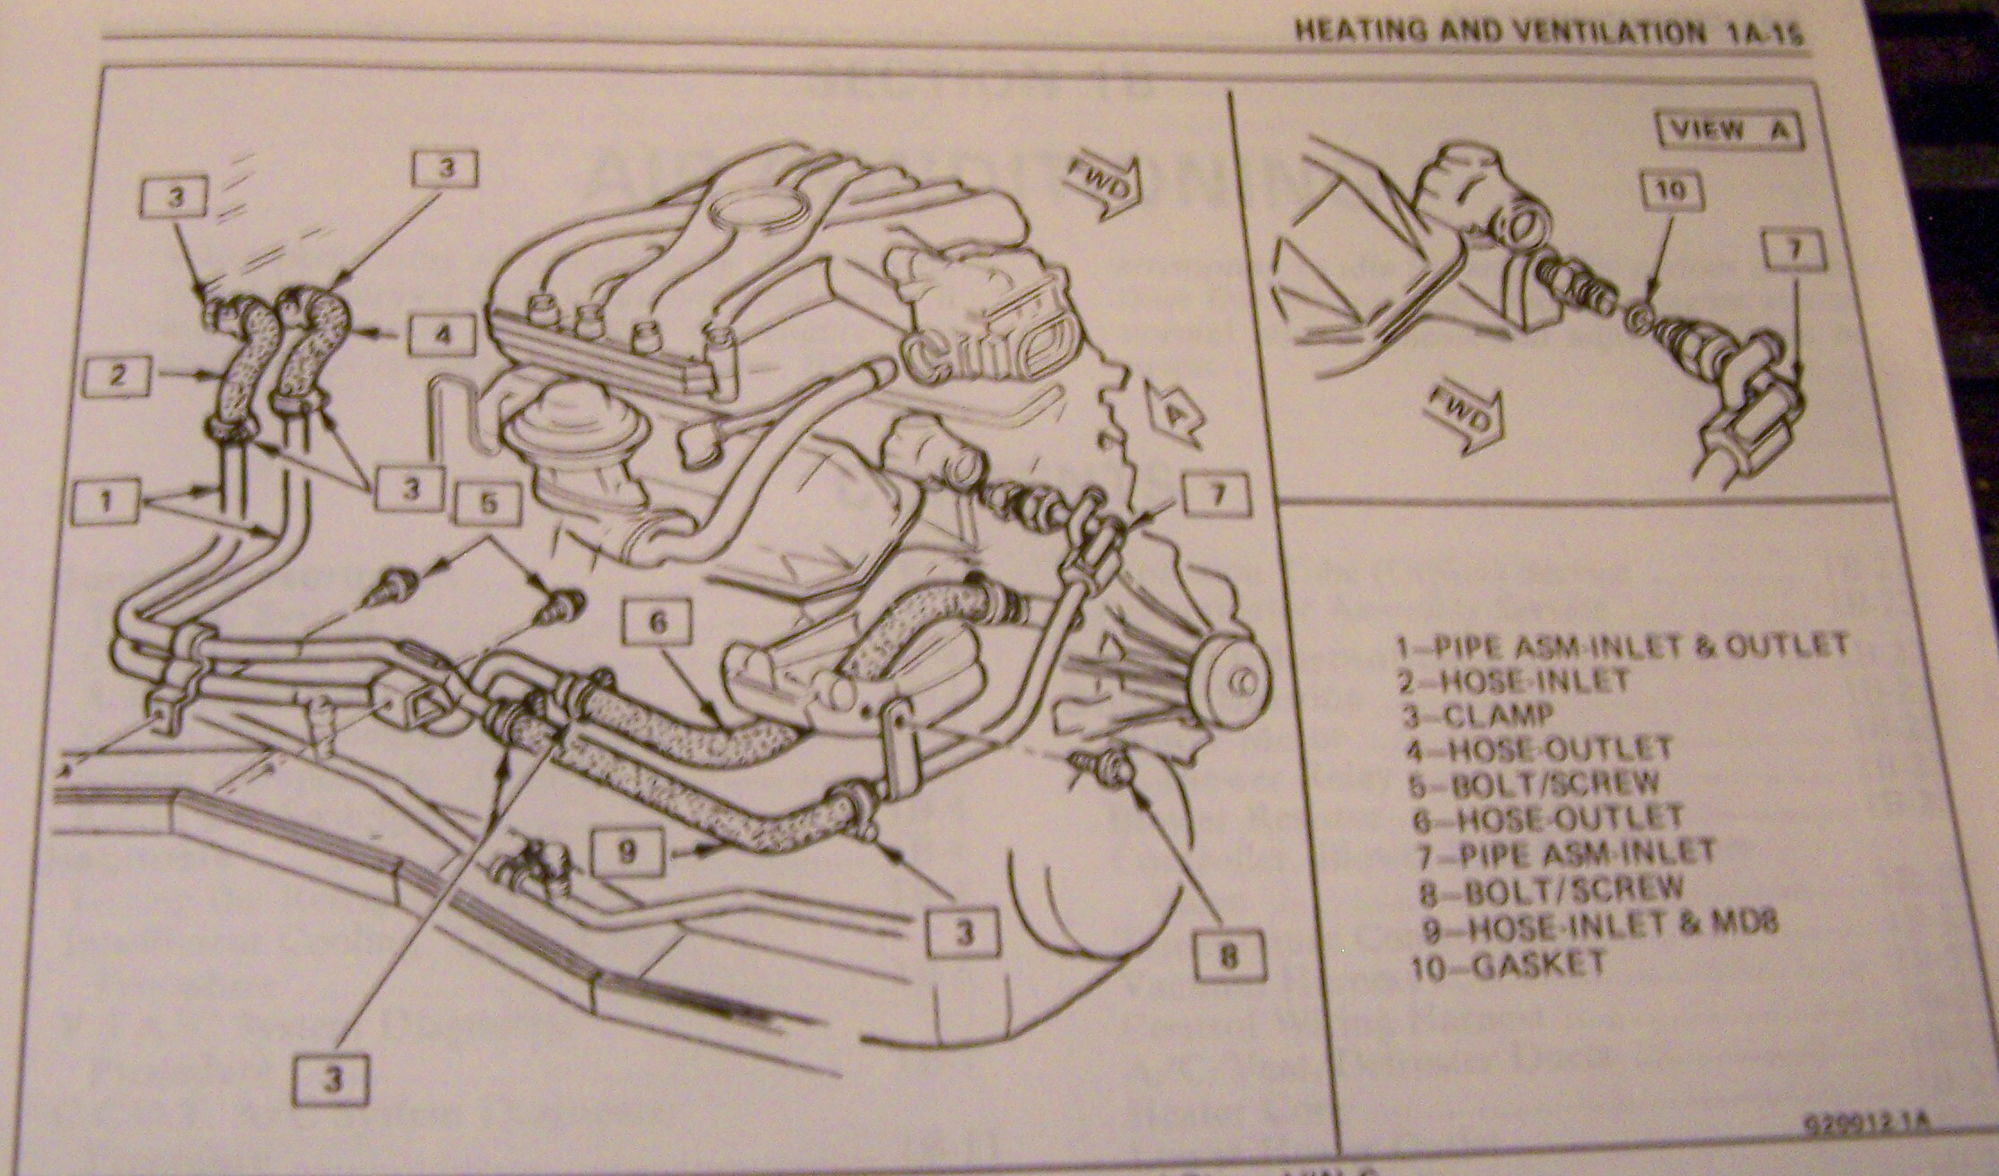 1992 firebird heater not working, I need help routing ...